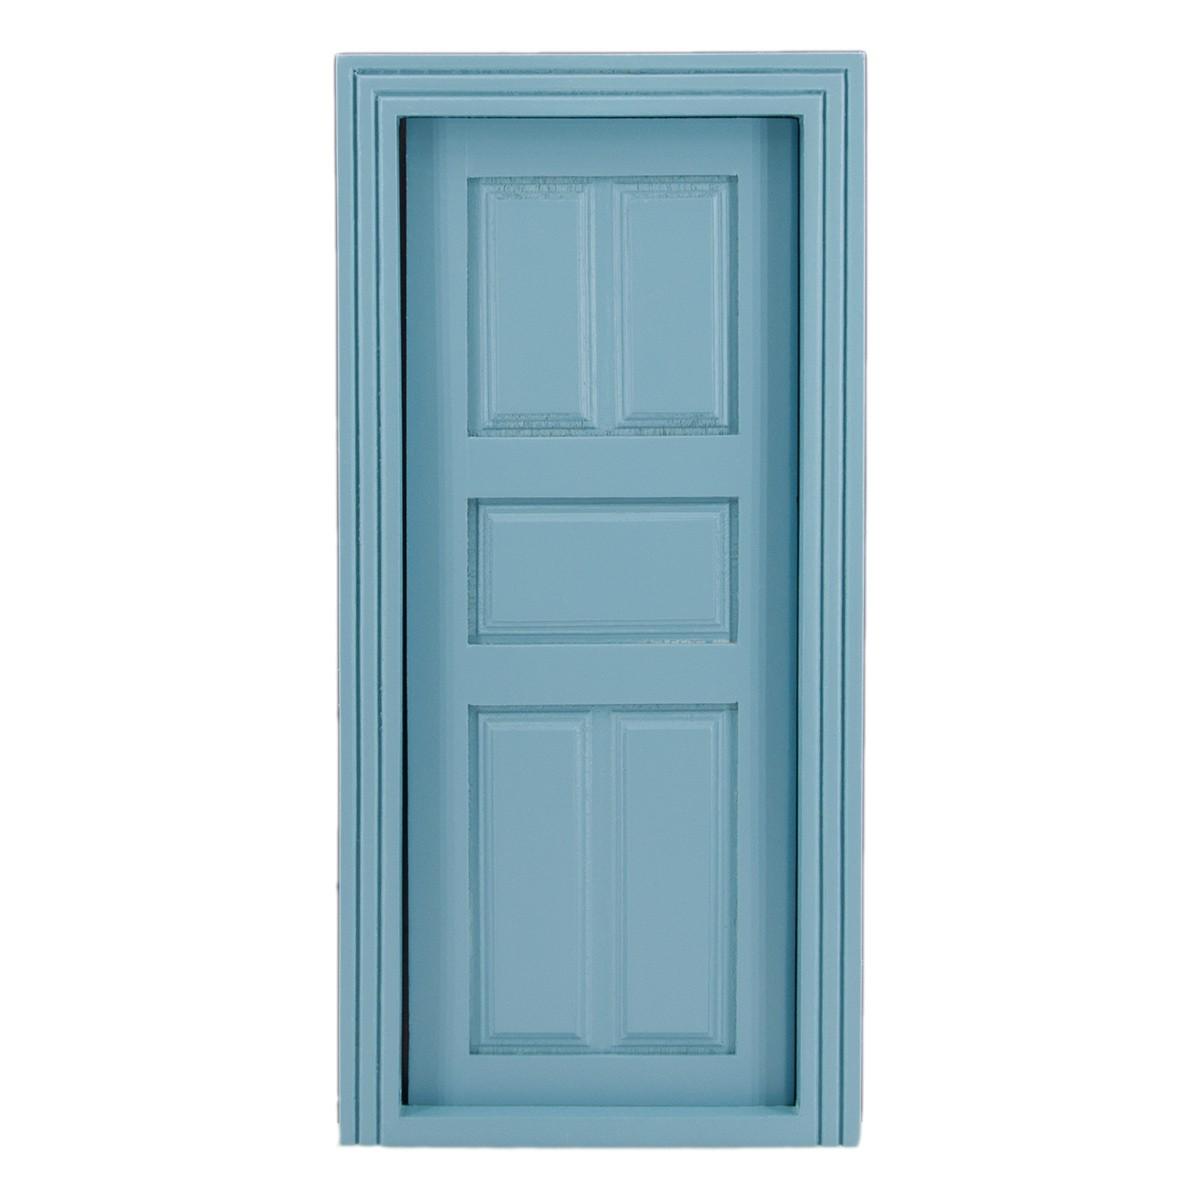 Paneel-Tür, blau